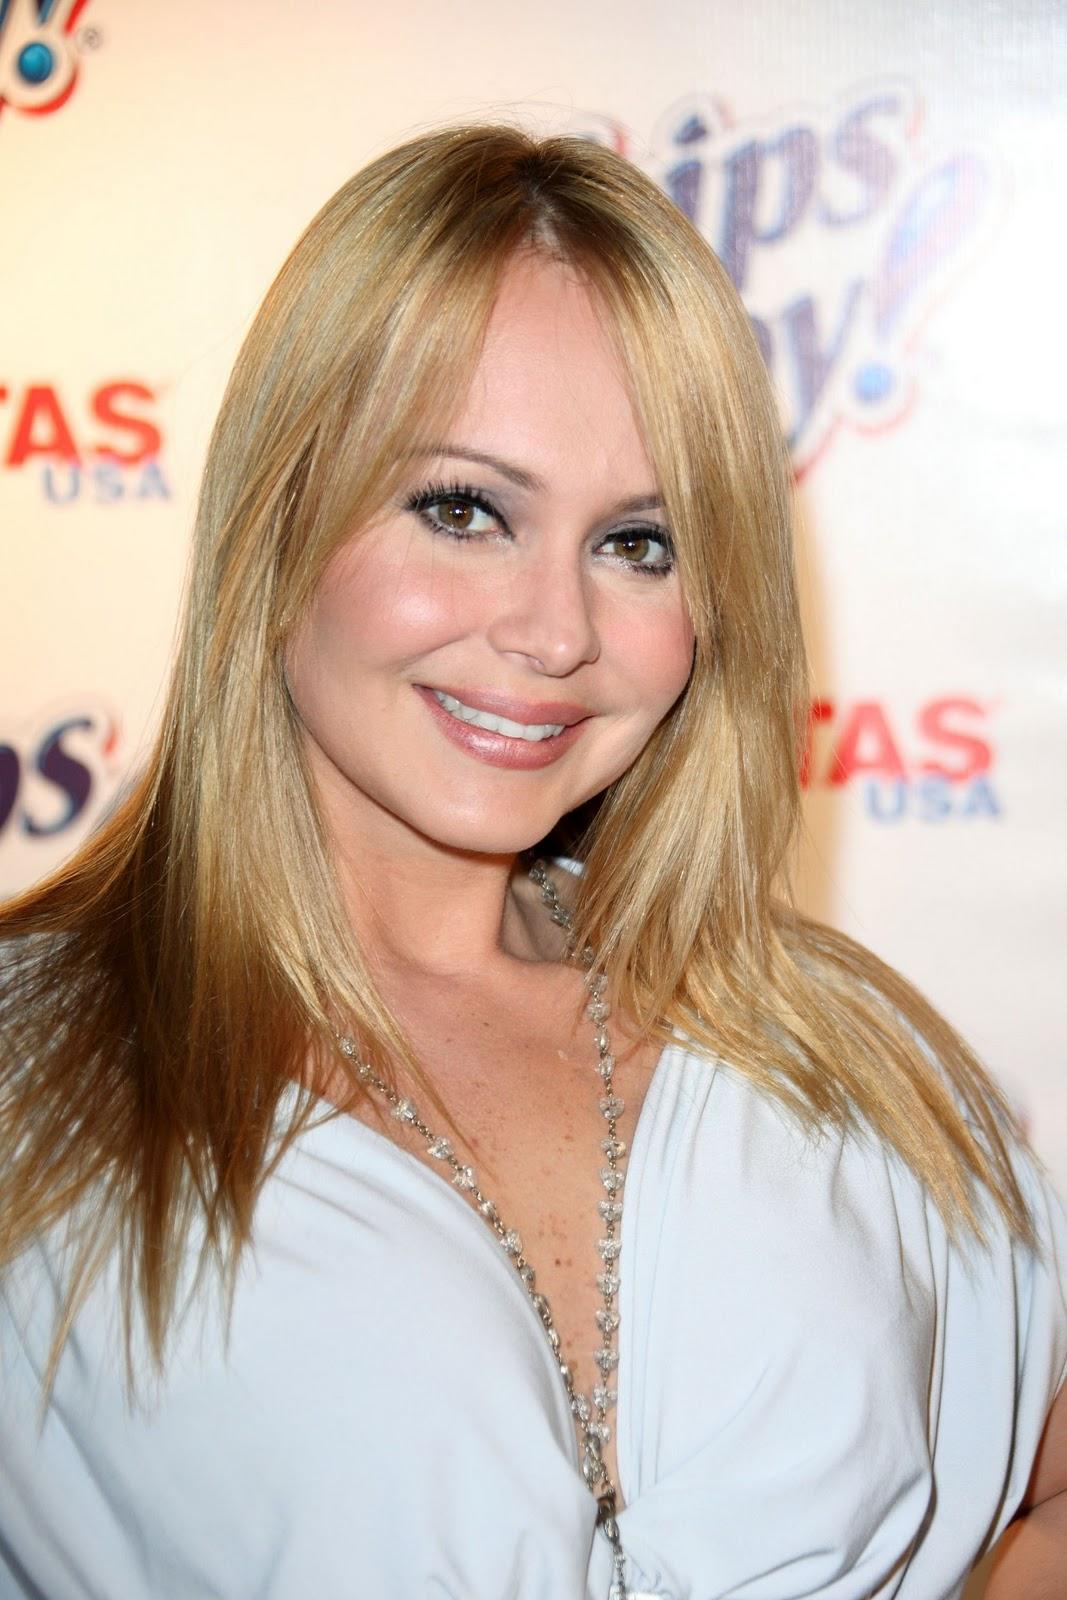 http://1.bp.blogspot.com/-s1SK1hSpgfU/TxlXz7cg0wI/AAAAAAAAHBc/ZCGktib236I/s1600/gabriela-spanic-linda-atriz-atual-recente-nova-como-esta-novela-tele-sucesso-famosa-celebridade-cabelos-loiros.jpg